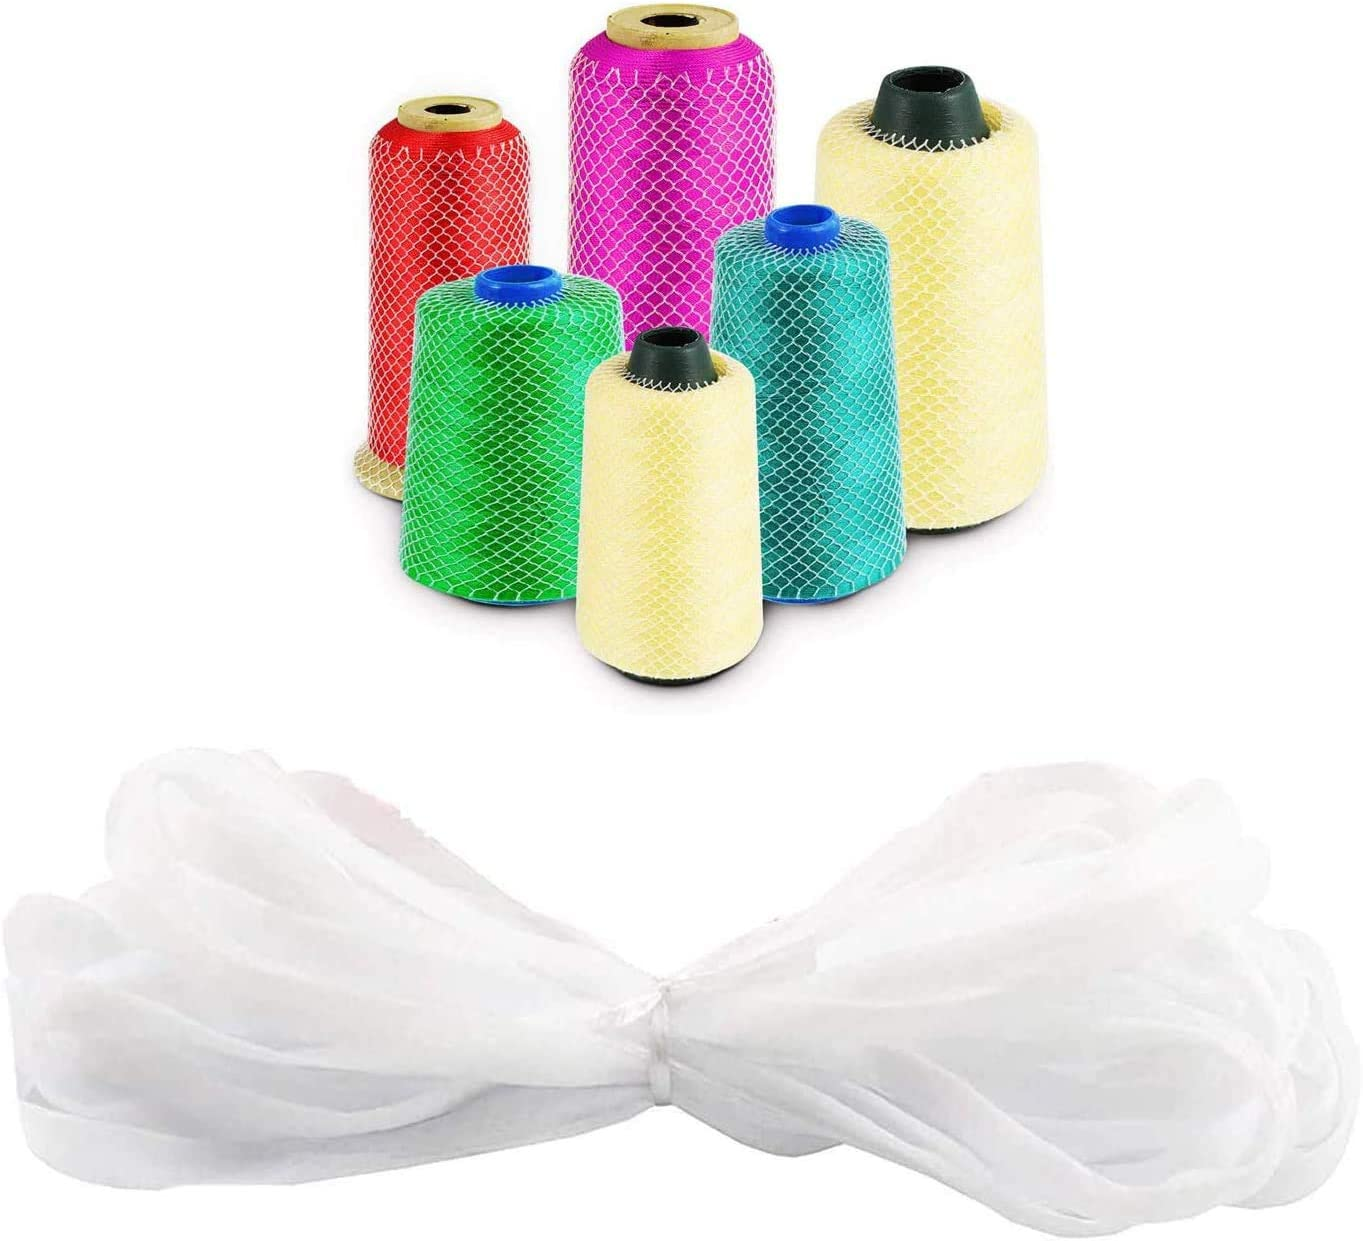 20 Yards Tucson Mall Embroidery Net Tthread Nets Em Sewing Thread safety Spool